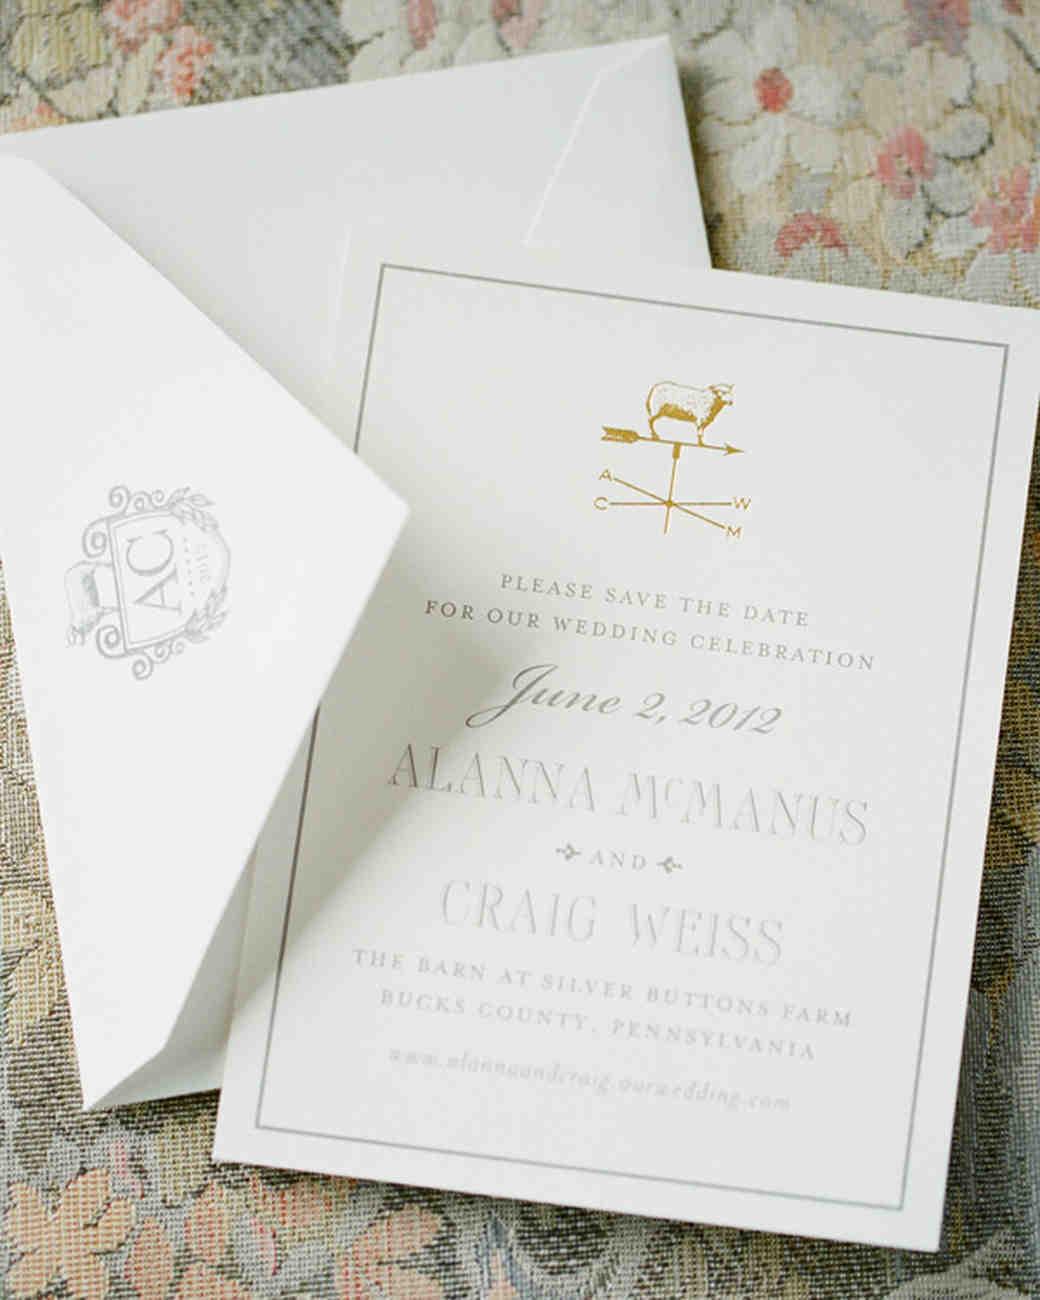 alanna-craig-invitations-0201-wds110658.jpg